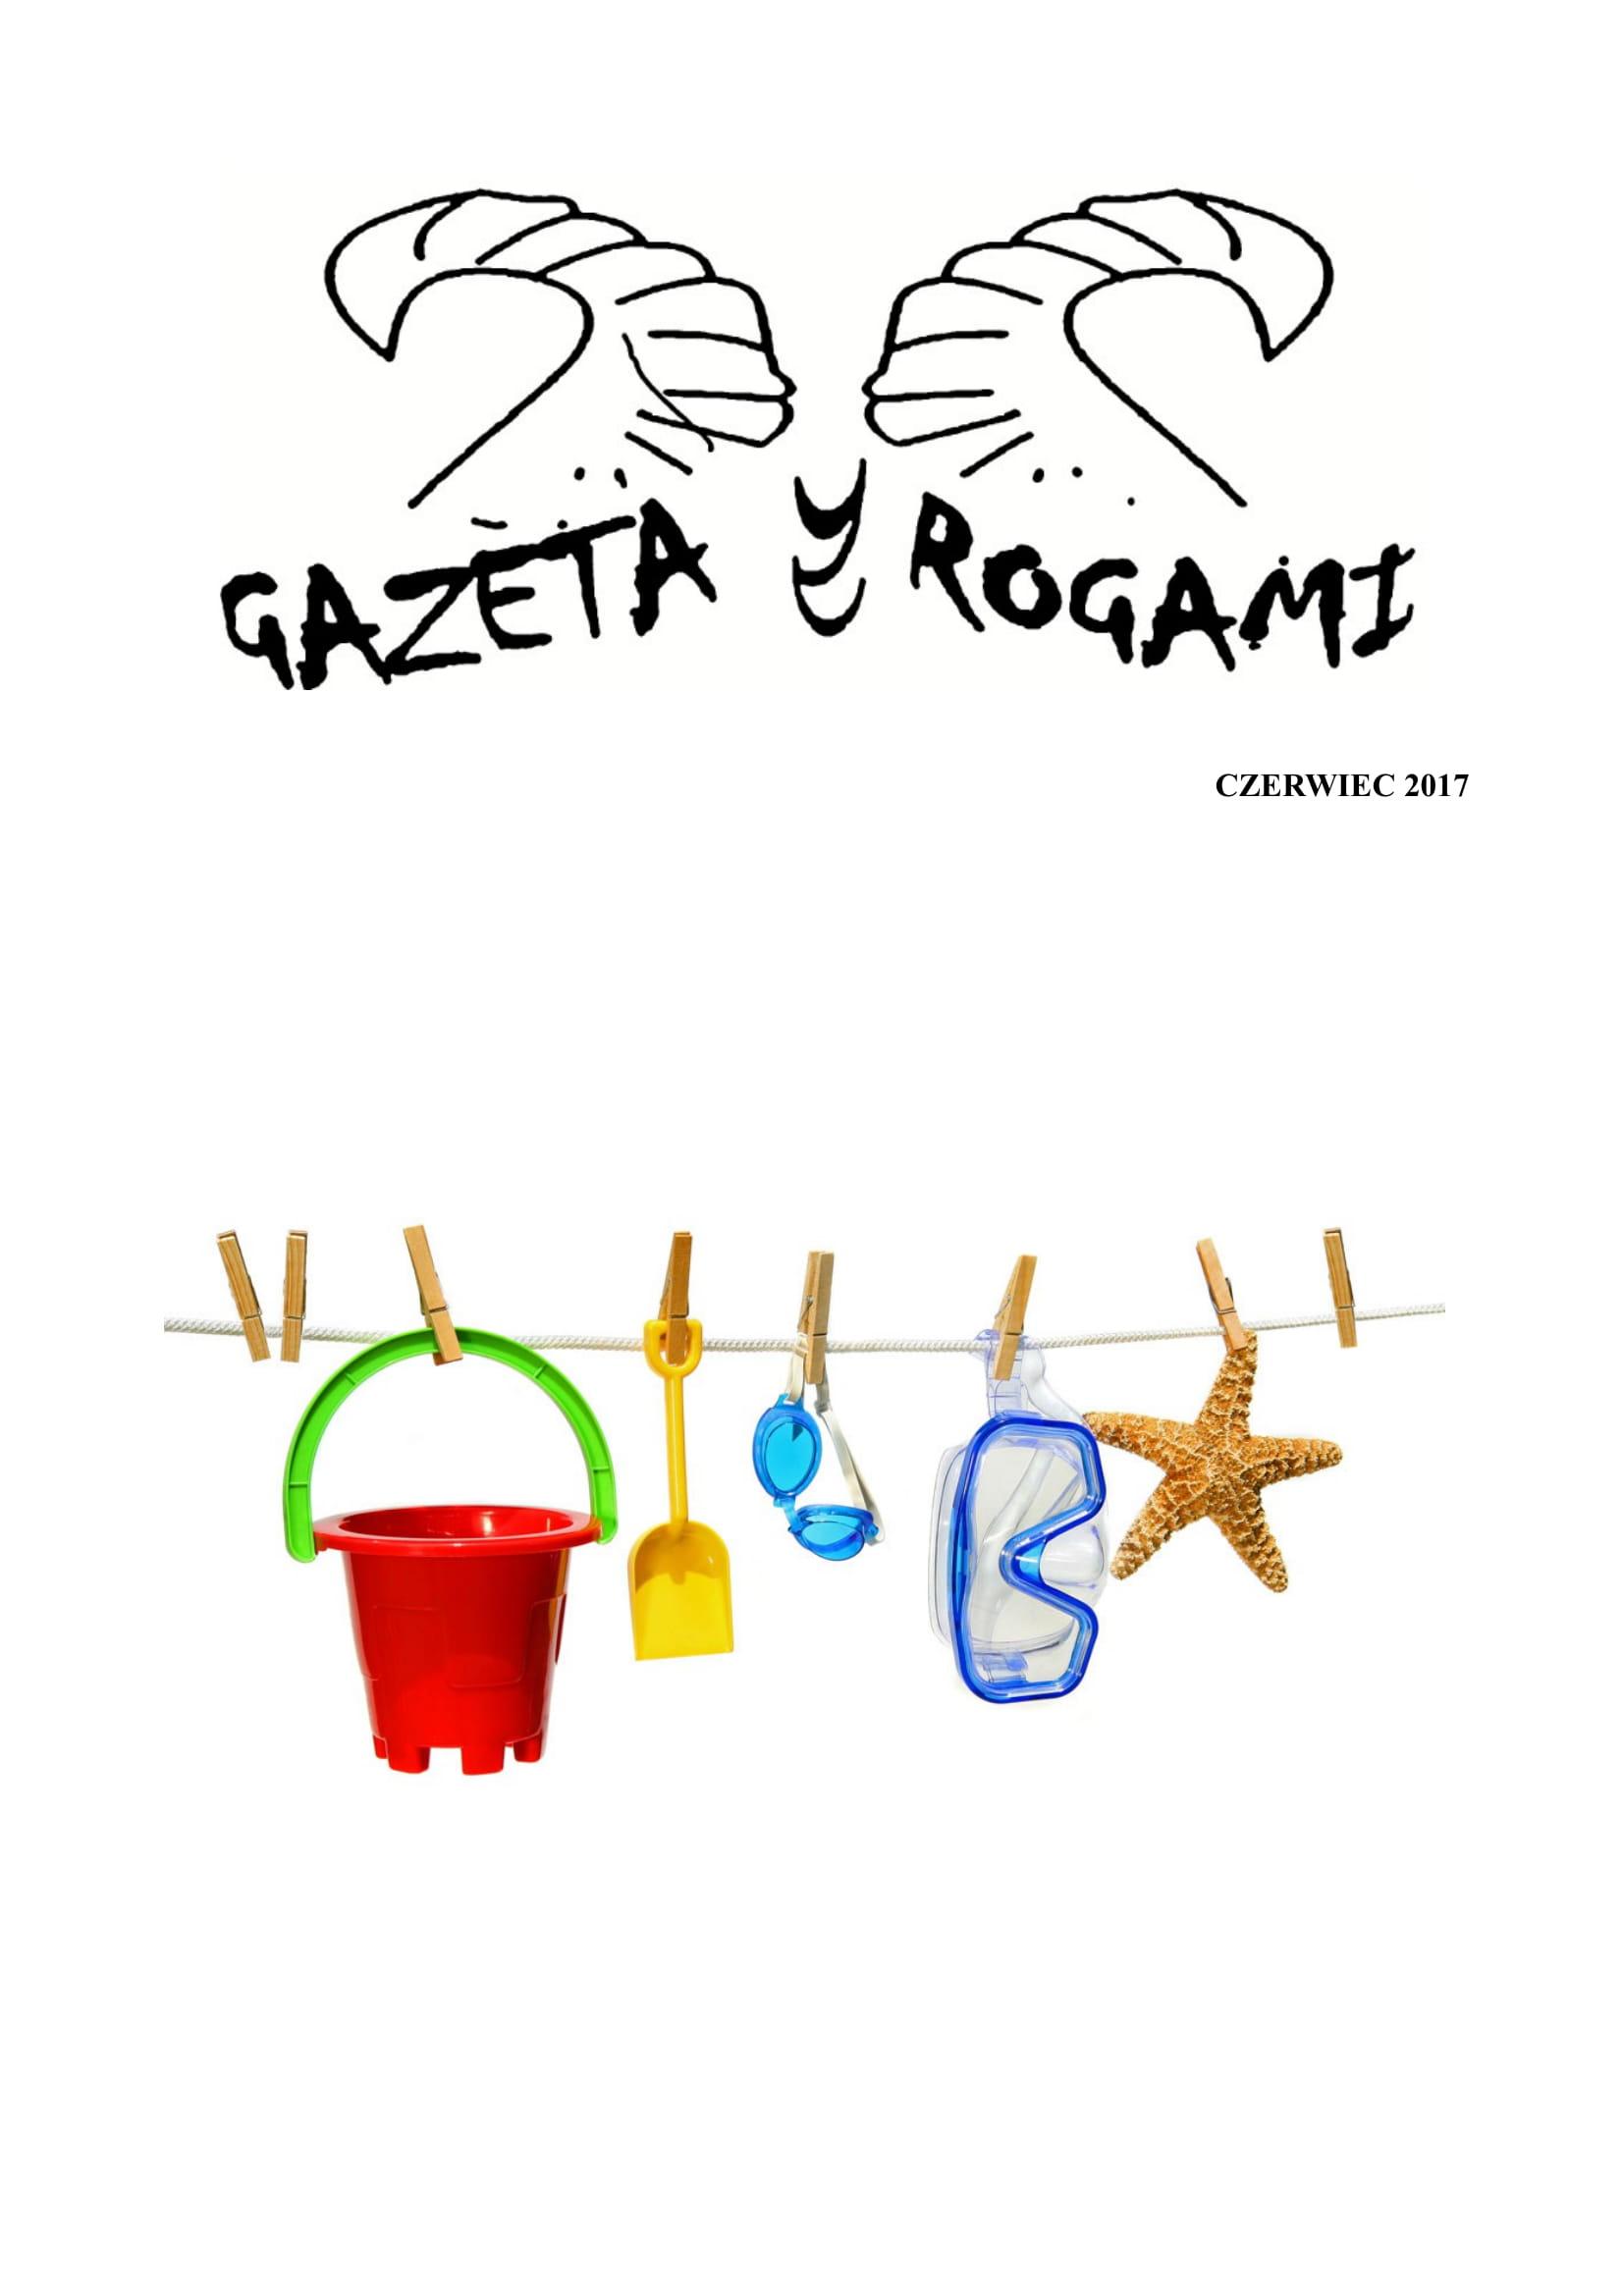 http://sp24sto.edu.pl/wp-content/uploads/sites/3/2018/02/Gazeta-4-2016.2017-01.jpg